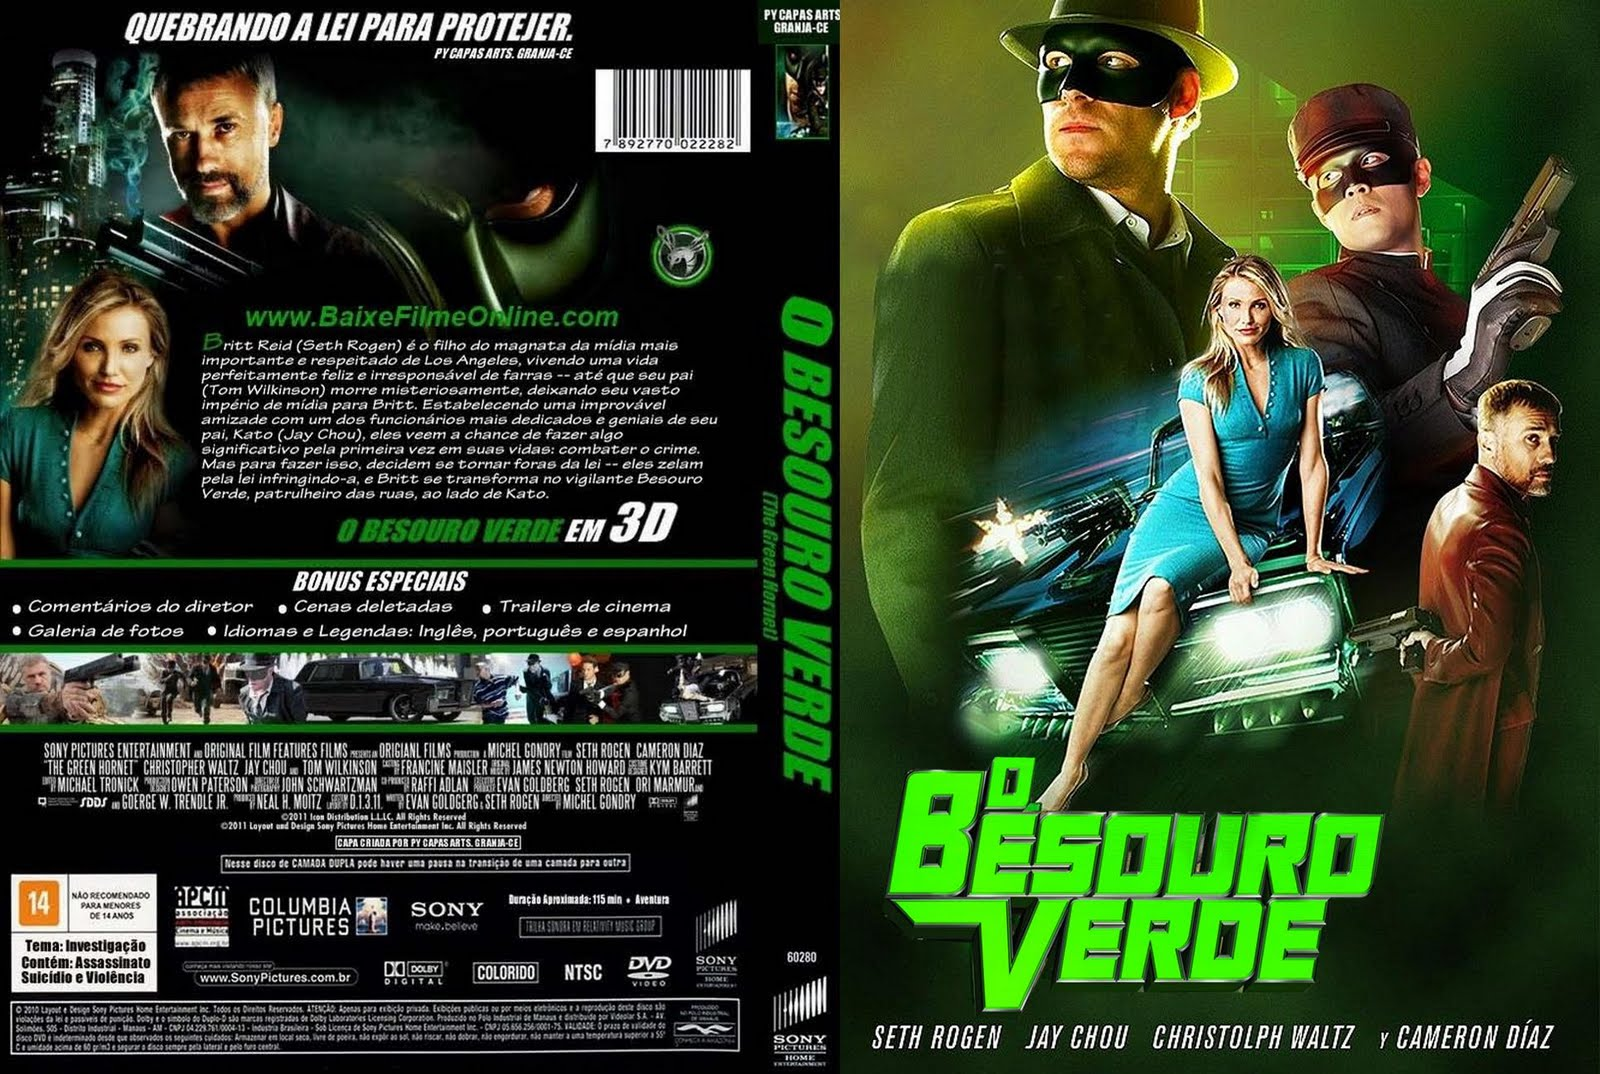 VERDE BAIXAR BESOURO FILME DVD-R